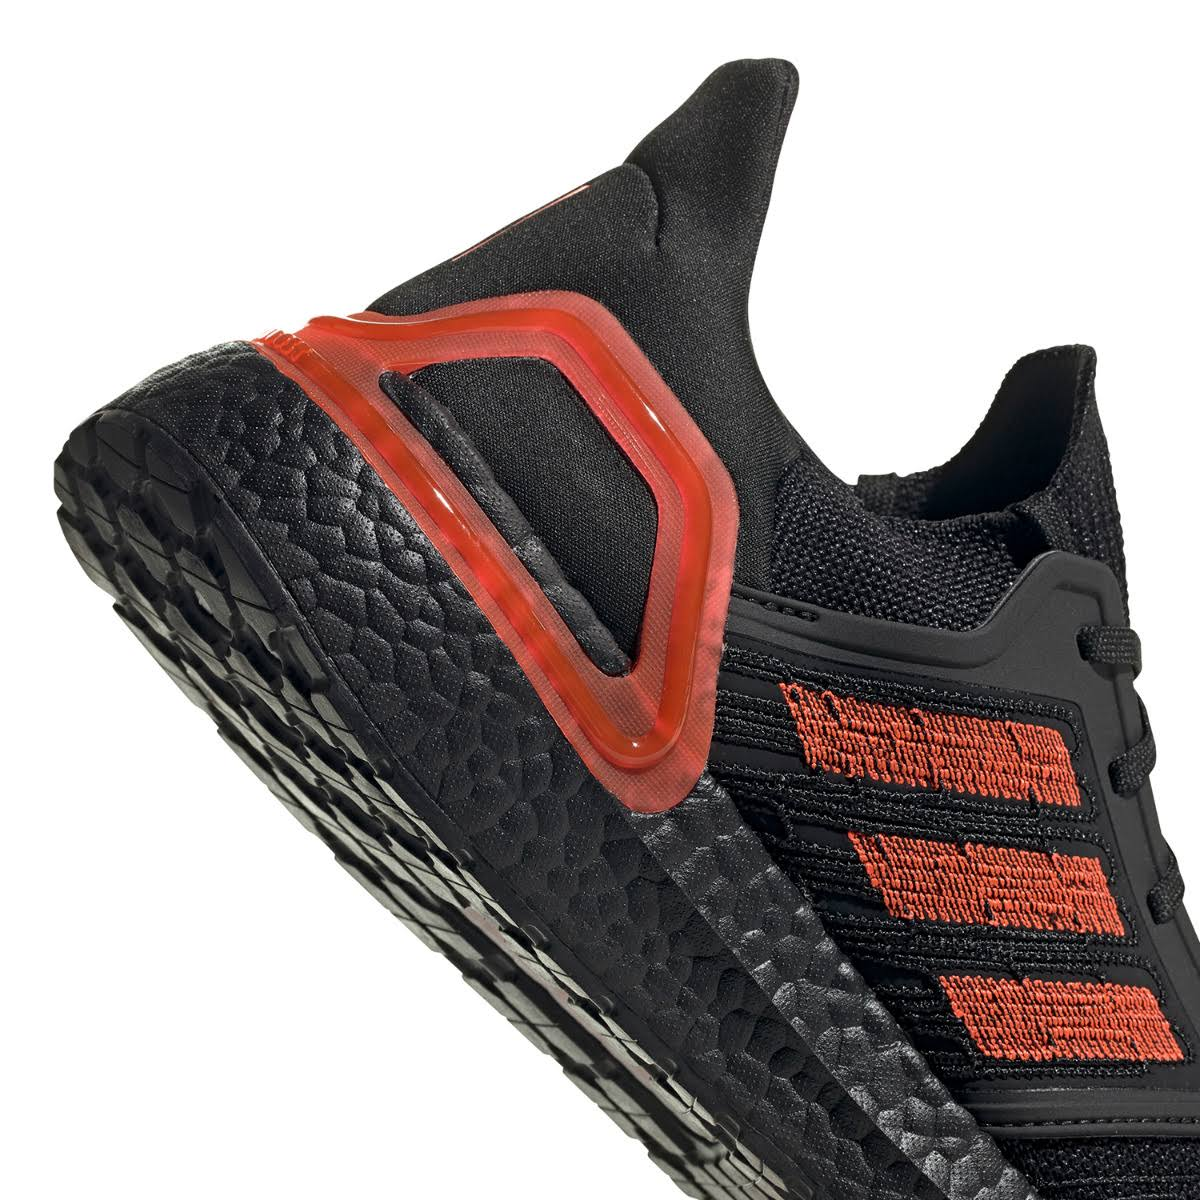 Adidas Ultraboost 20 Black